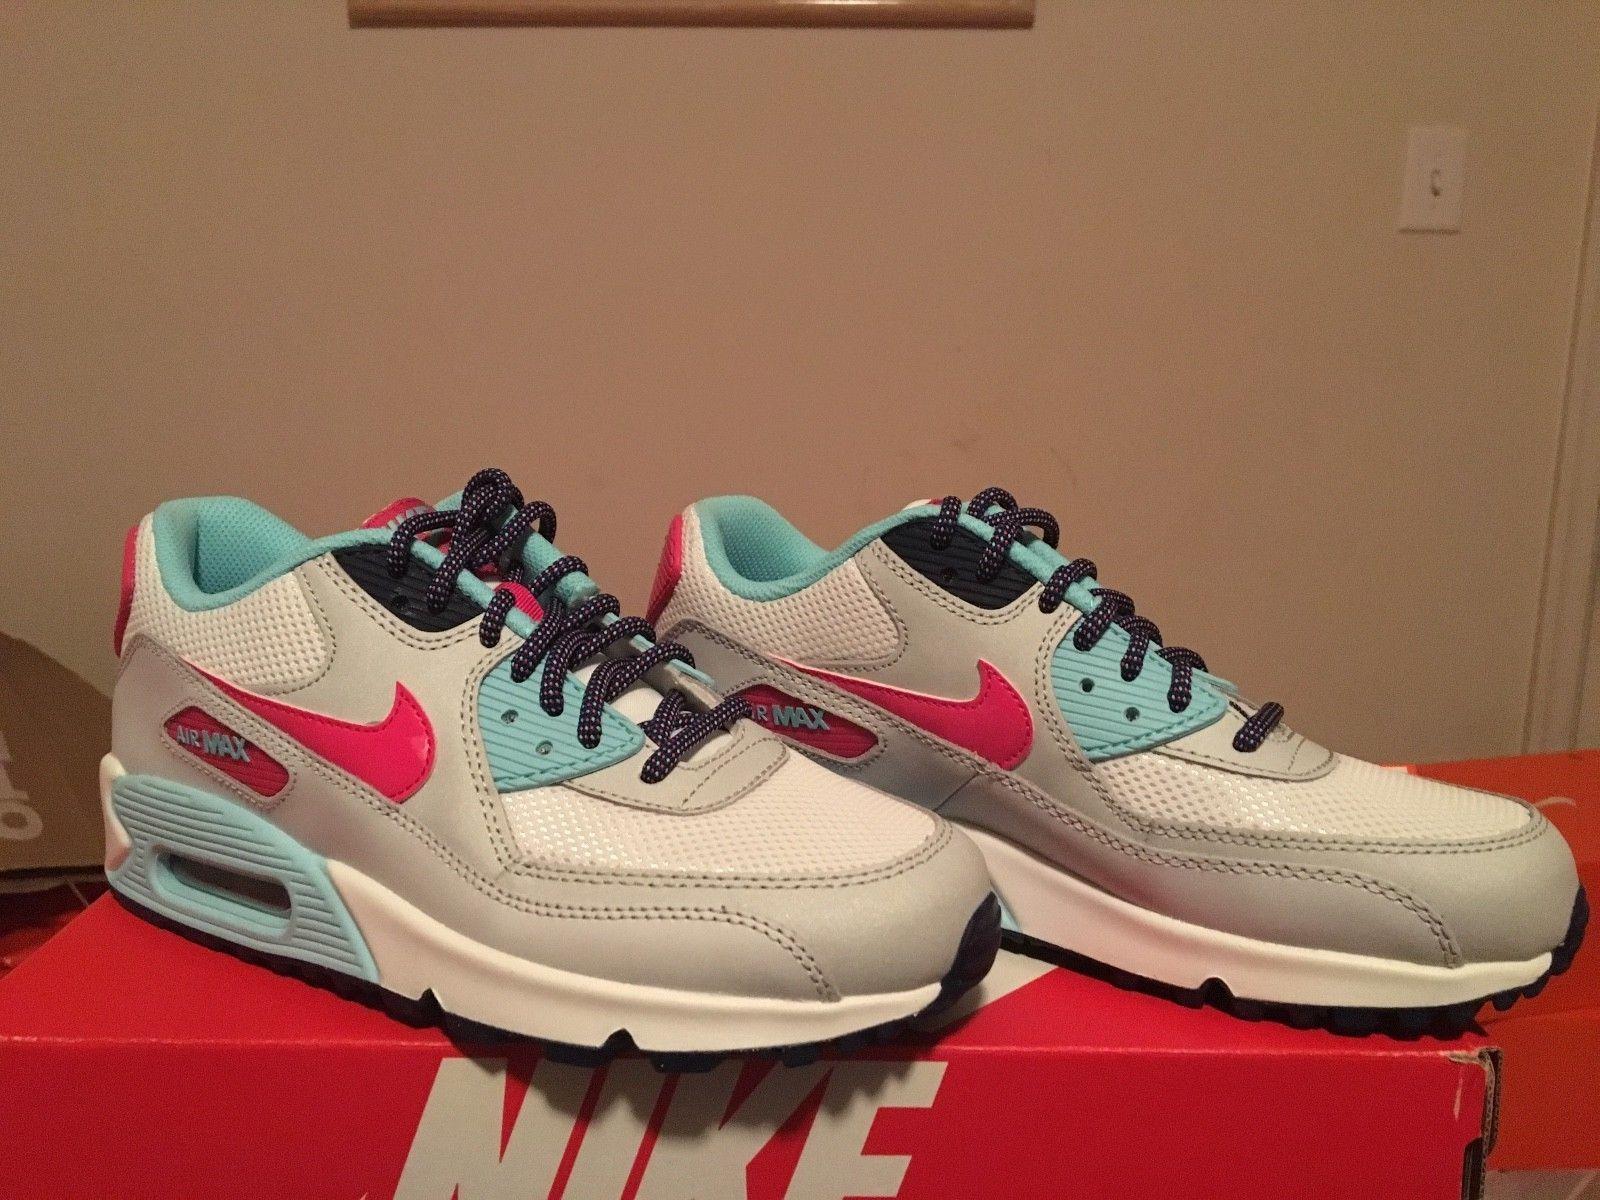 Nike Air Max 90 Mesh (GS) 724855 102 size and similar items